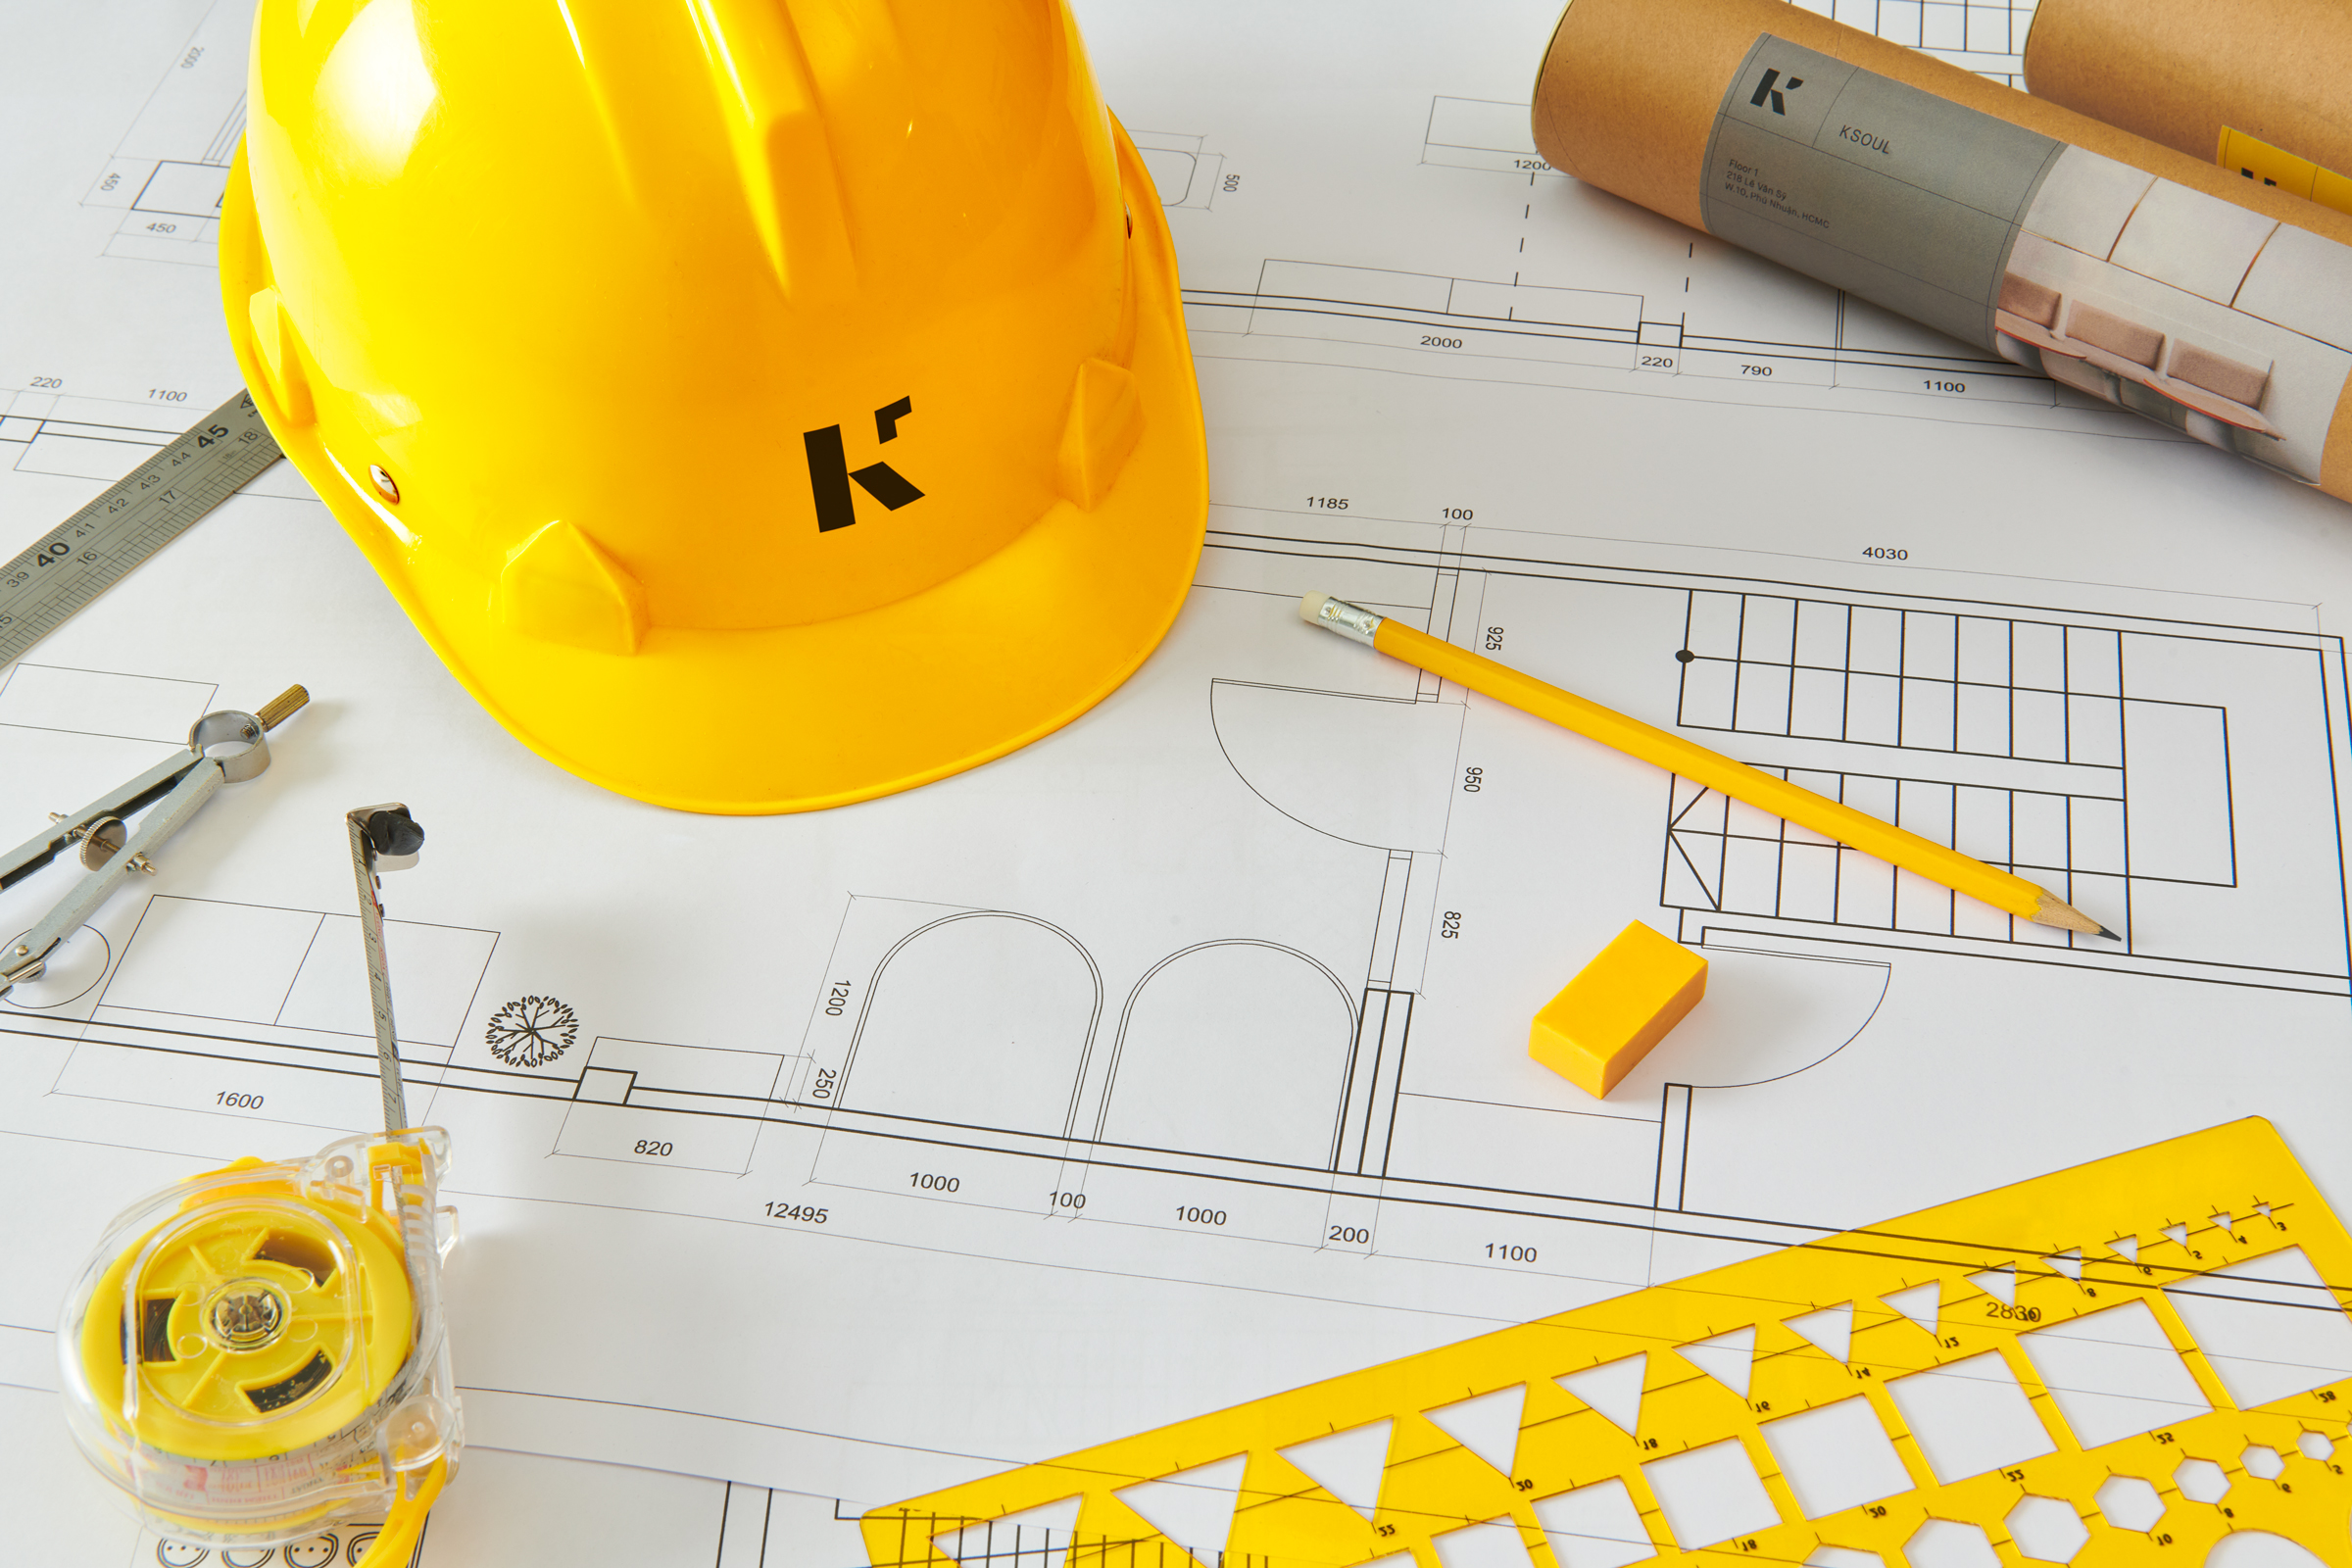 M — N Associates Design Ksoul Studio Branding for Architecture and Interior Practice